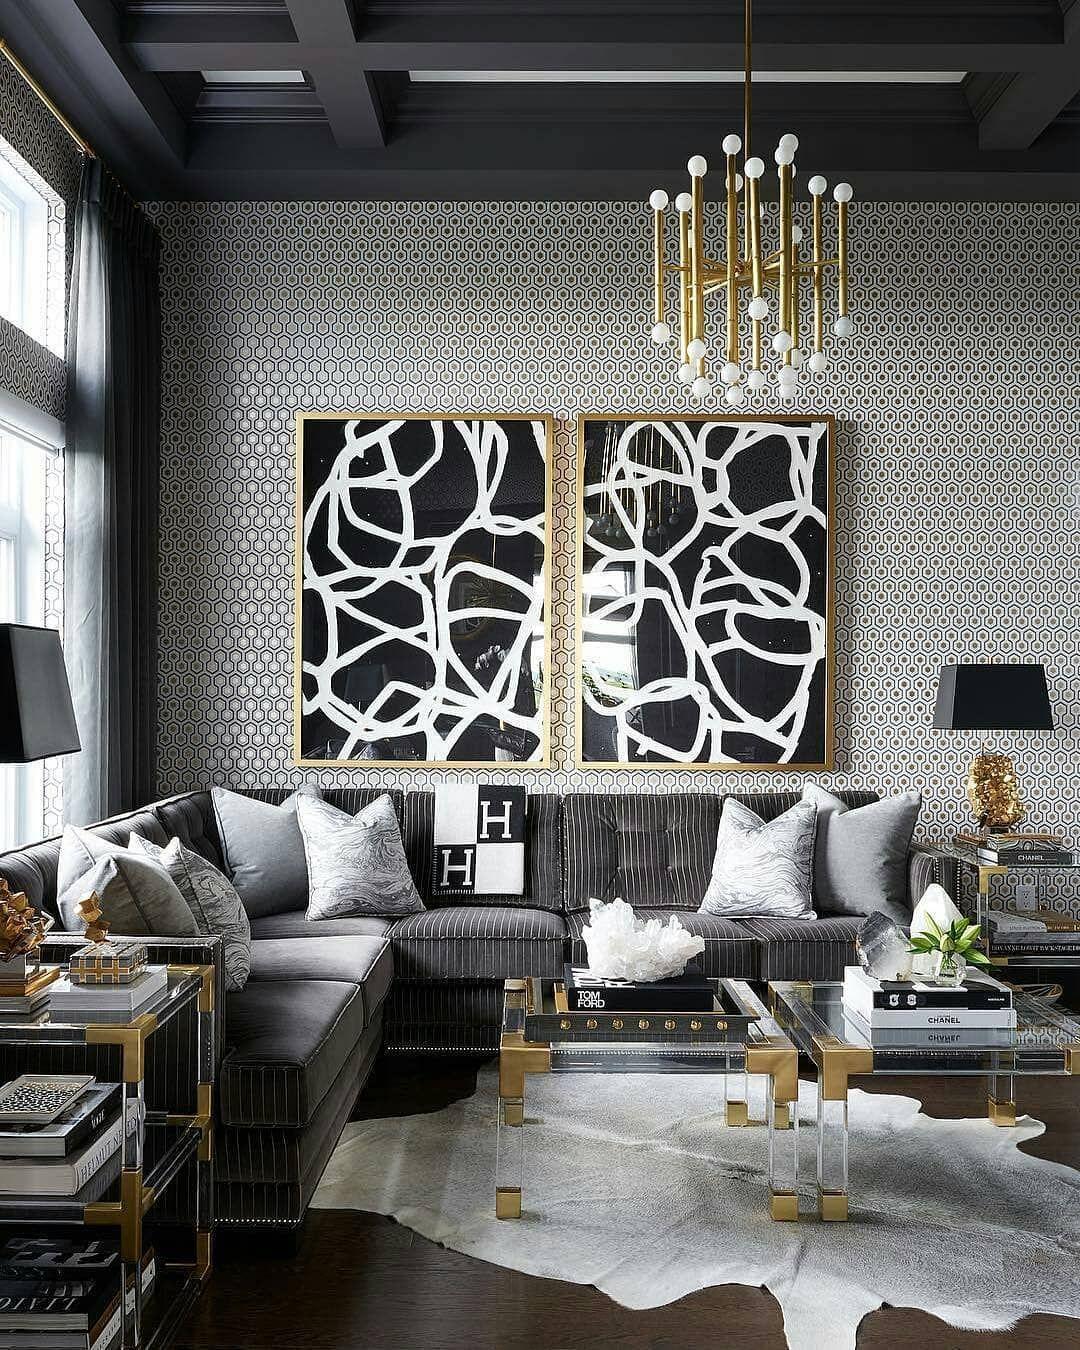 Prime Residence Decor On Instagram Grey Black Gold And White